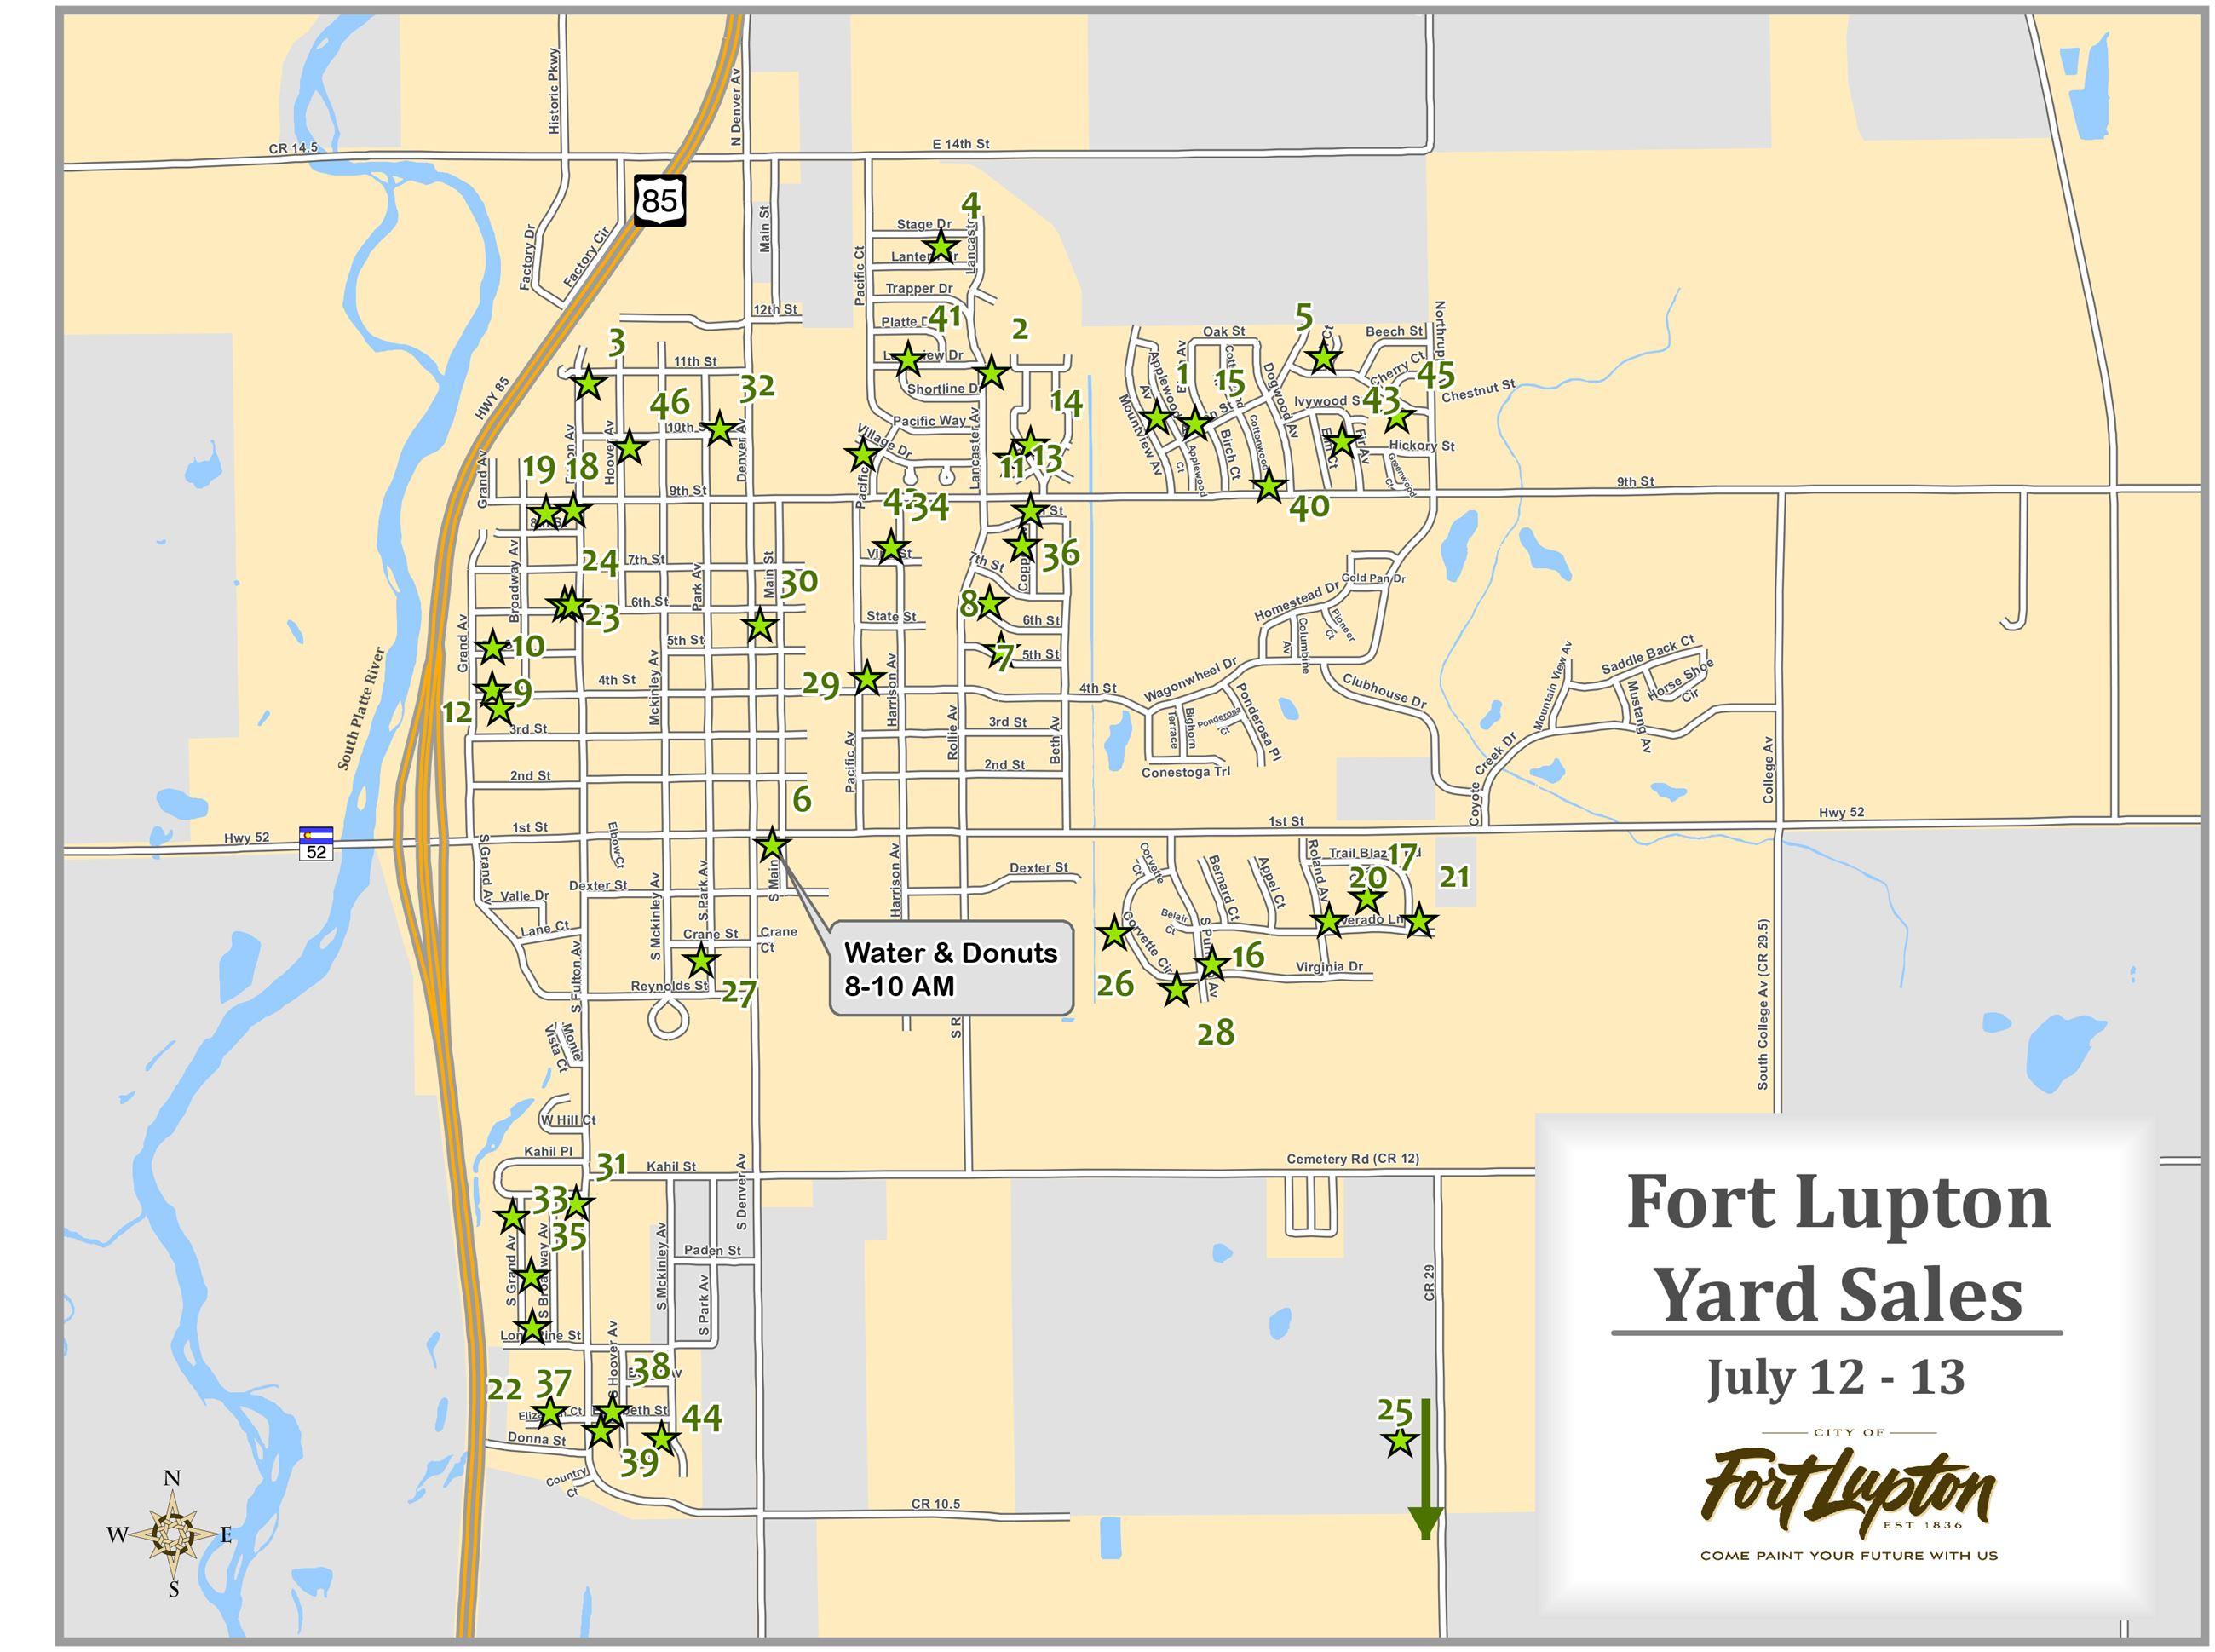 City Wide Yard Sale - July 13 & July 14, 2018 | Fort Lupton, CO